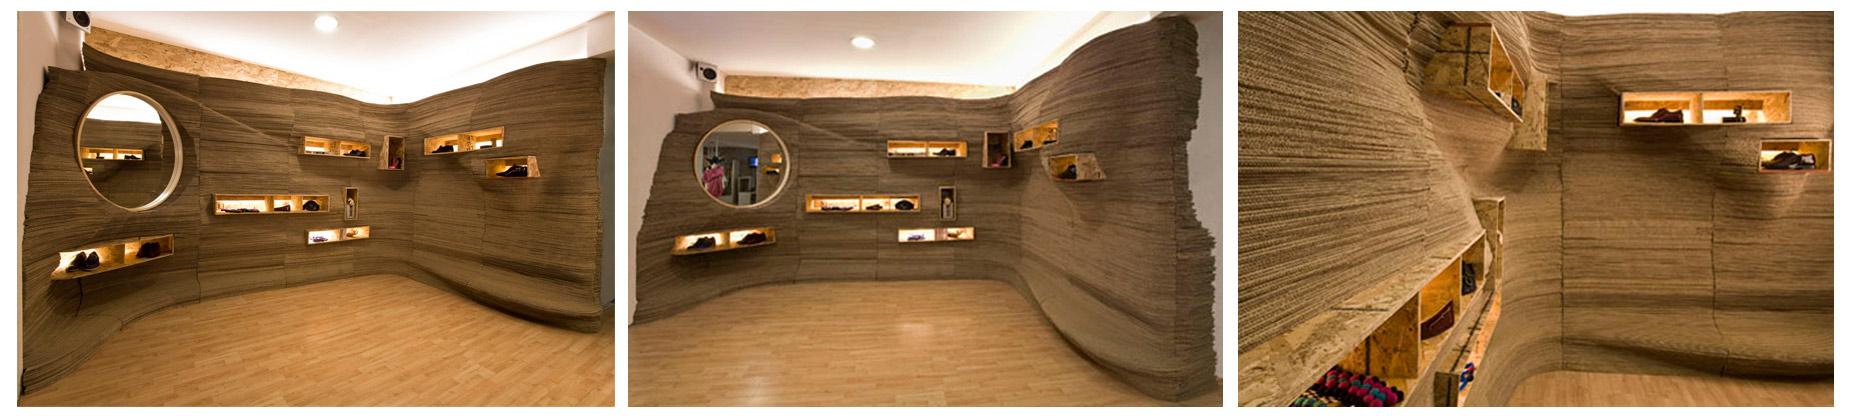 pop-up-store-shop-cardboard-cartonlab-design-7